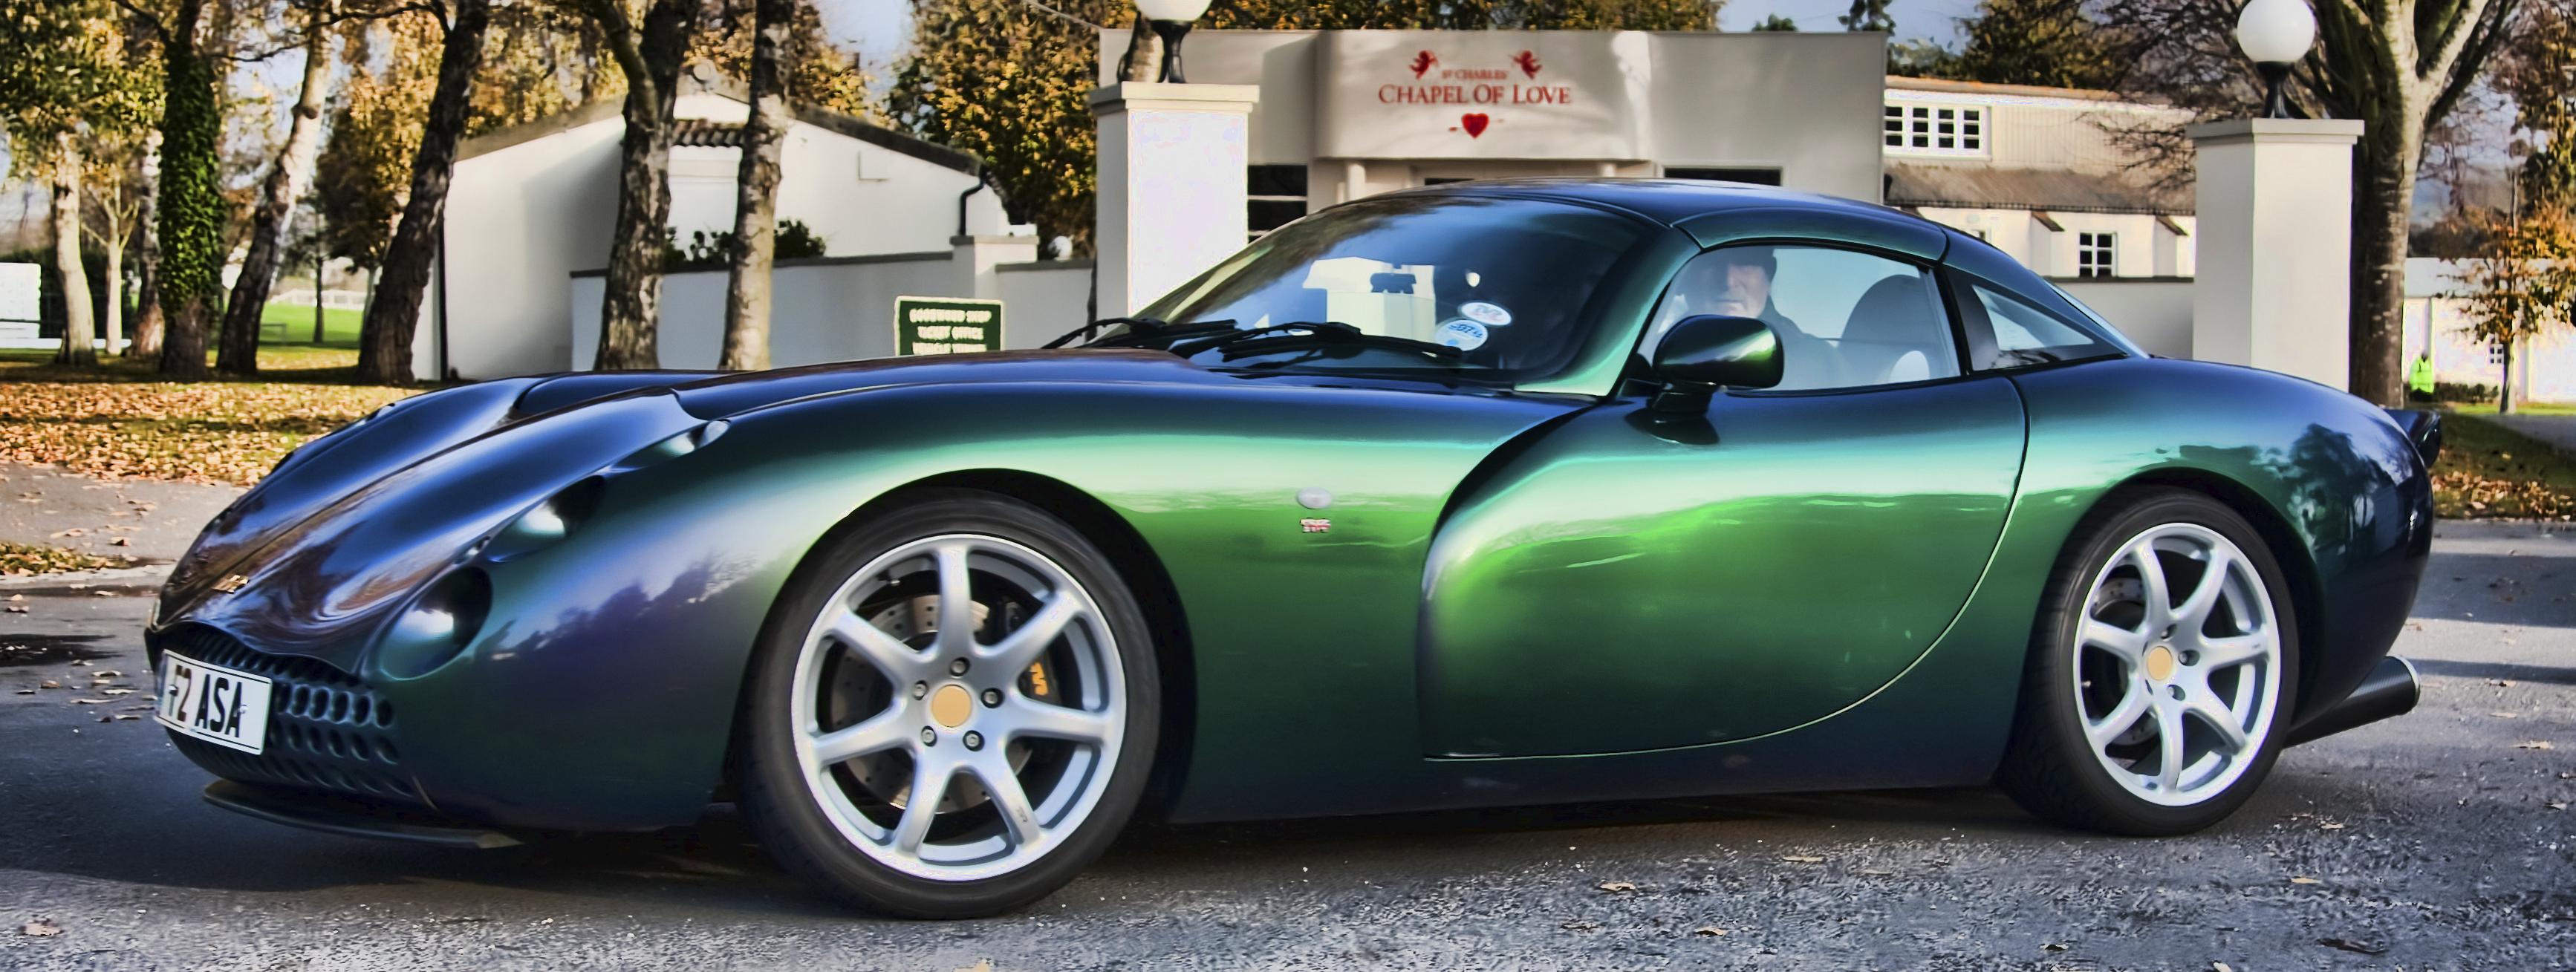 rxgreentiv's car